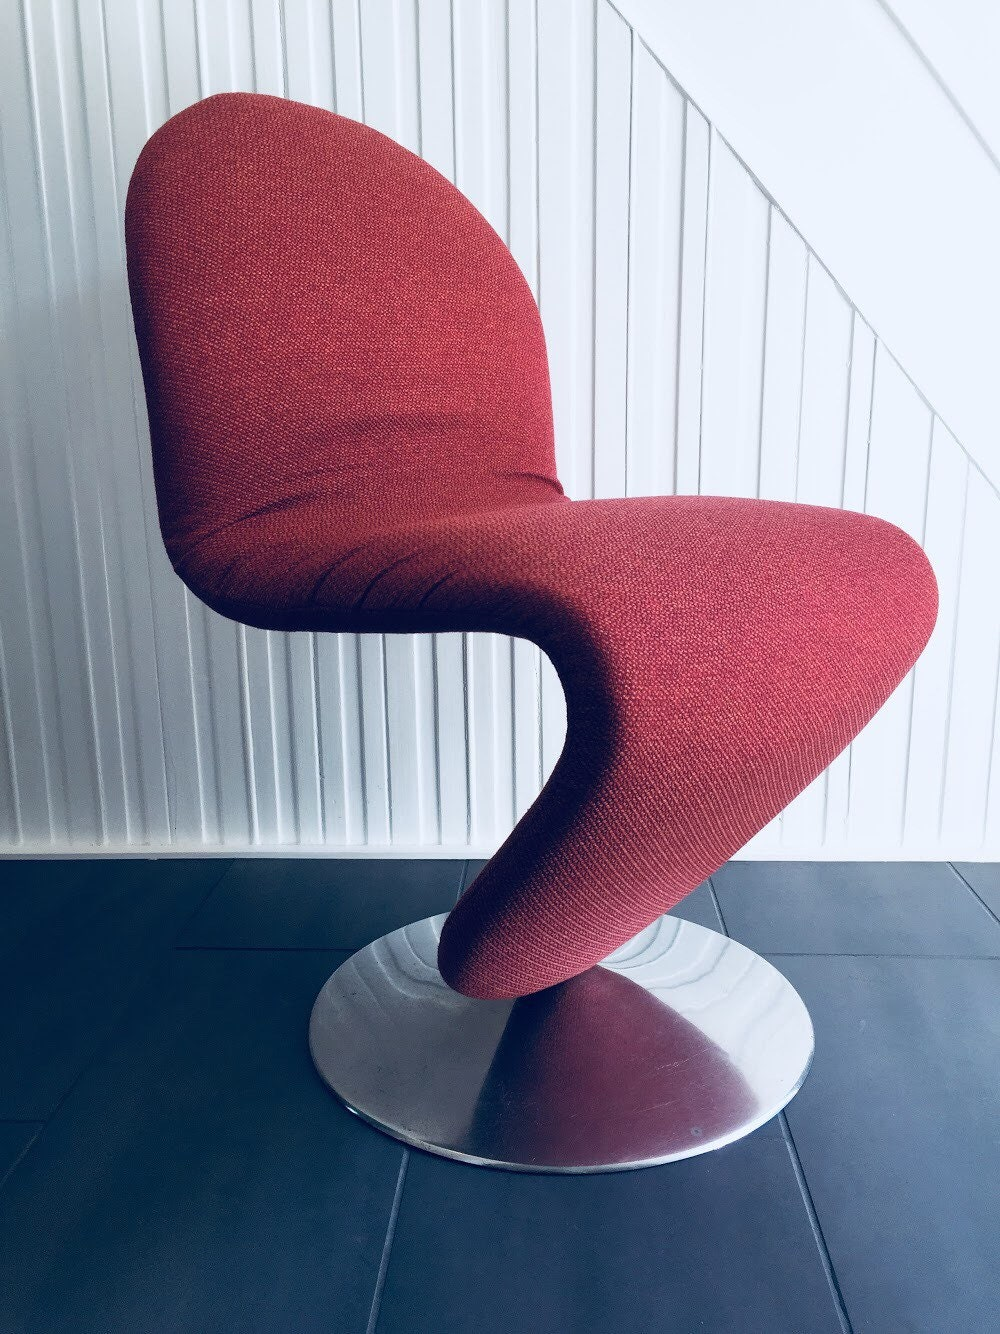 2x original verner panton 1 2 3 system chairs for fritz hansen etsy. Black Bedroom Furniture Sets. Home Design Ideas